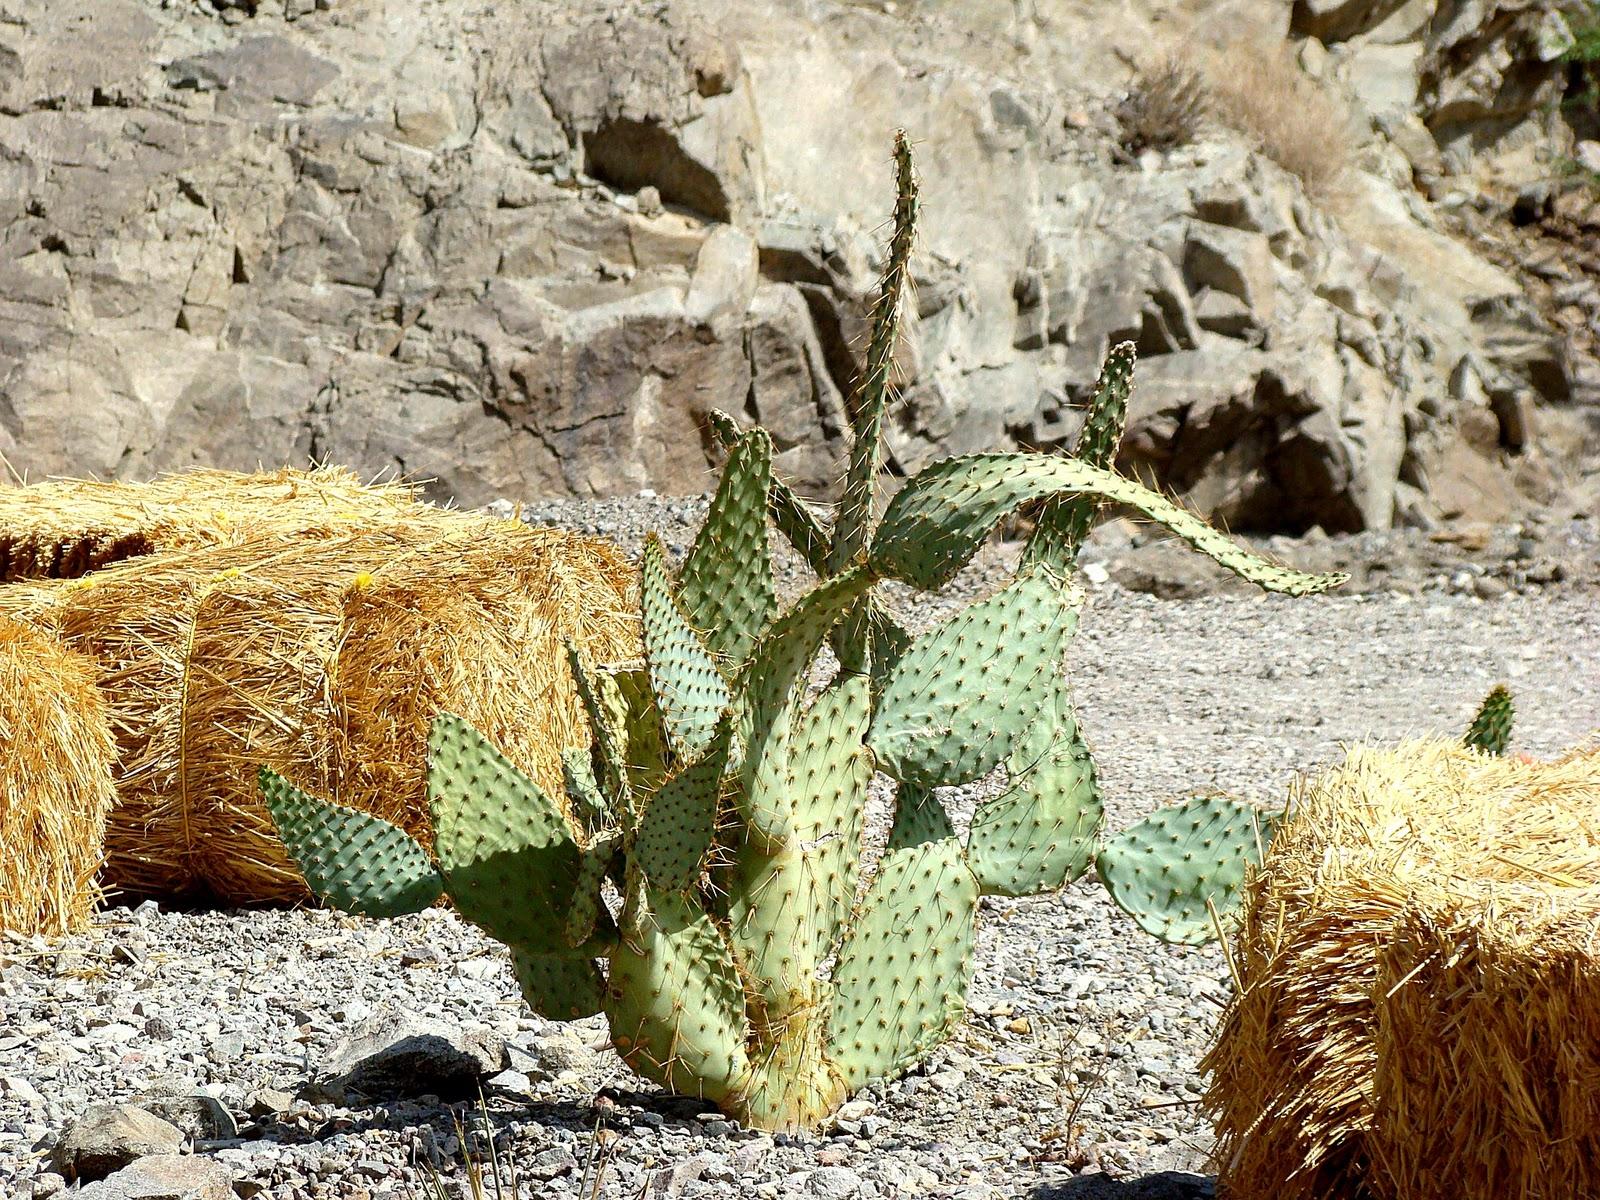 PicturesPool: Desert Plants,Flowers,Trees